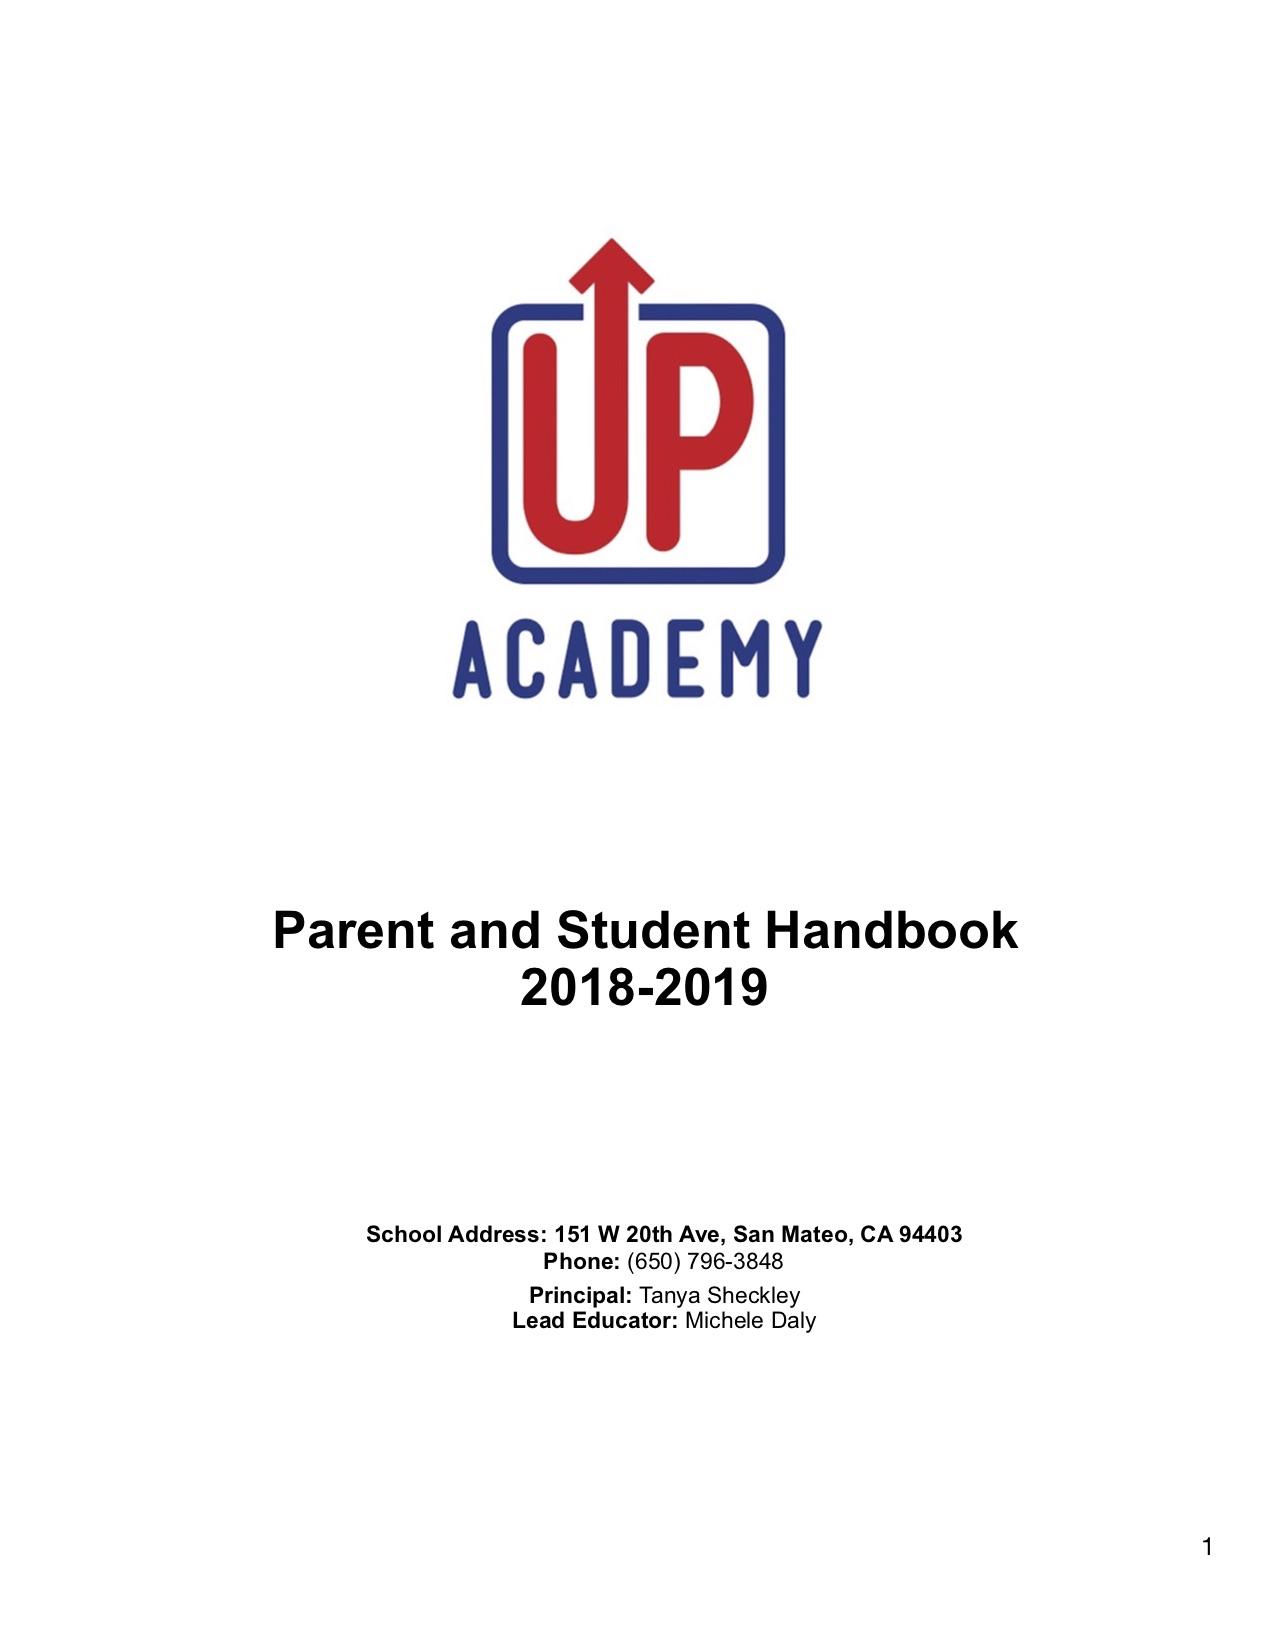 18-19 Parent and Student Handbook V4.jpg